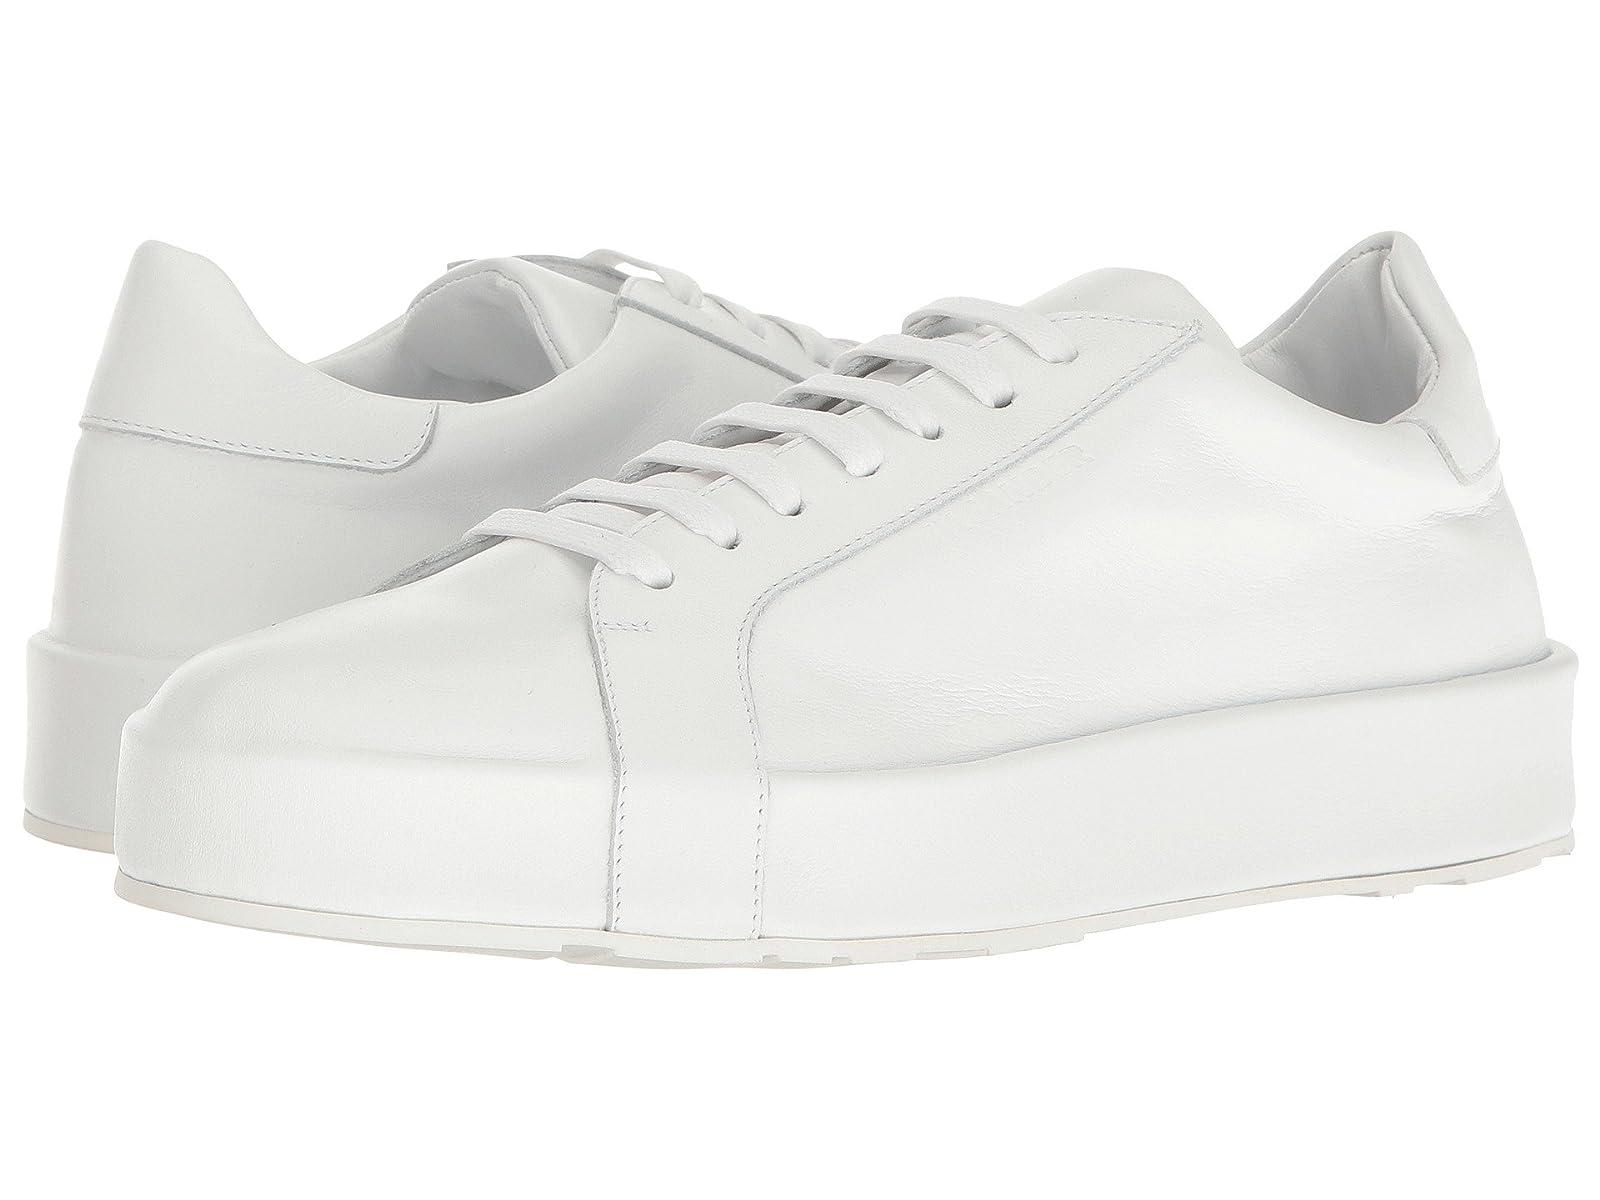 Jil Sander JS25155Cheap and distinctive eye-catching shoes